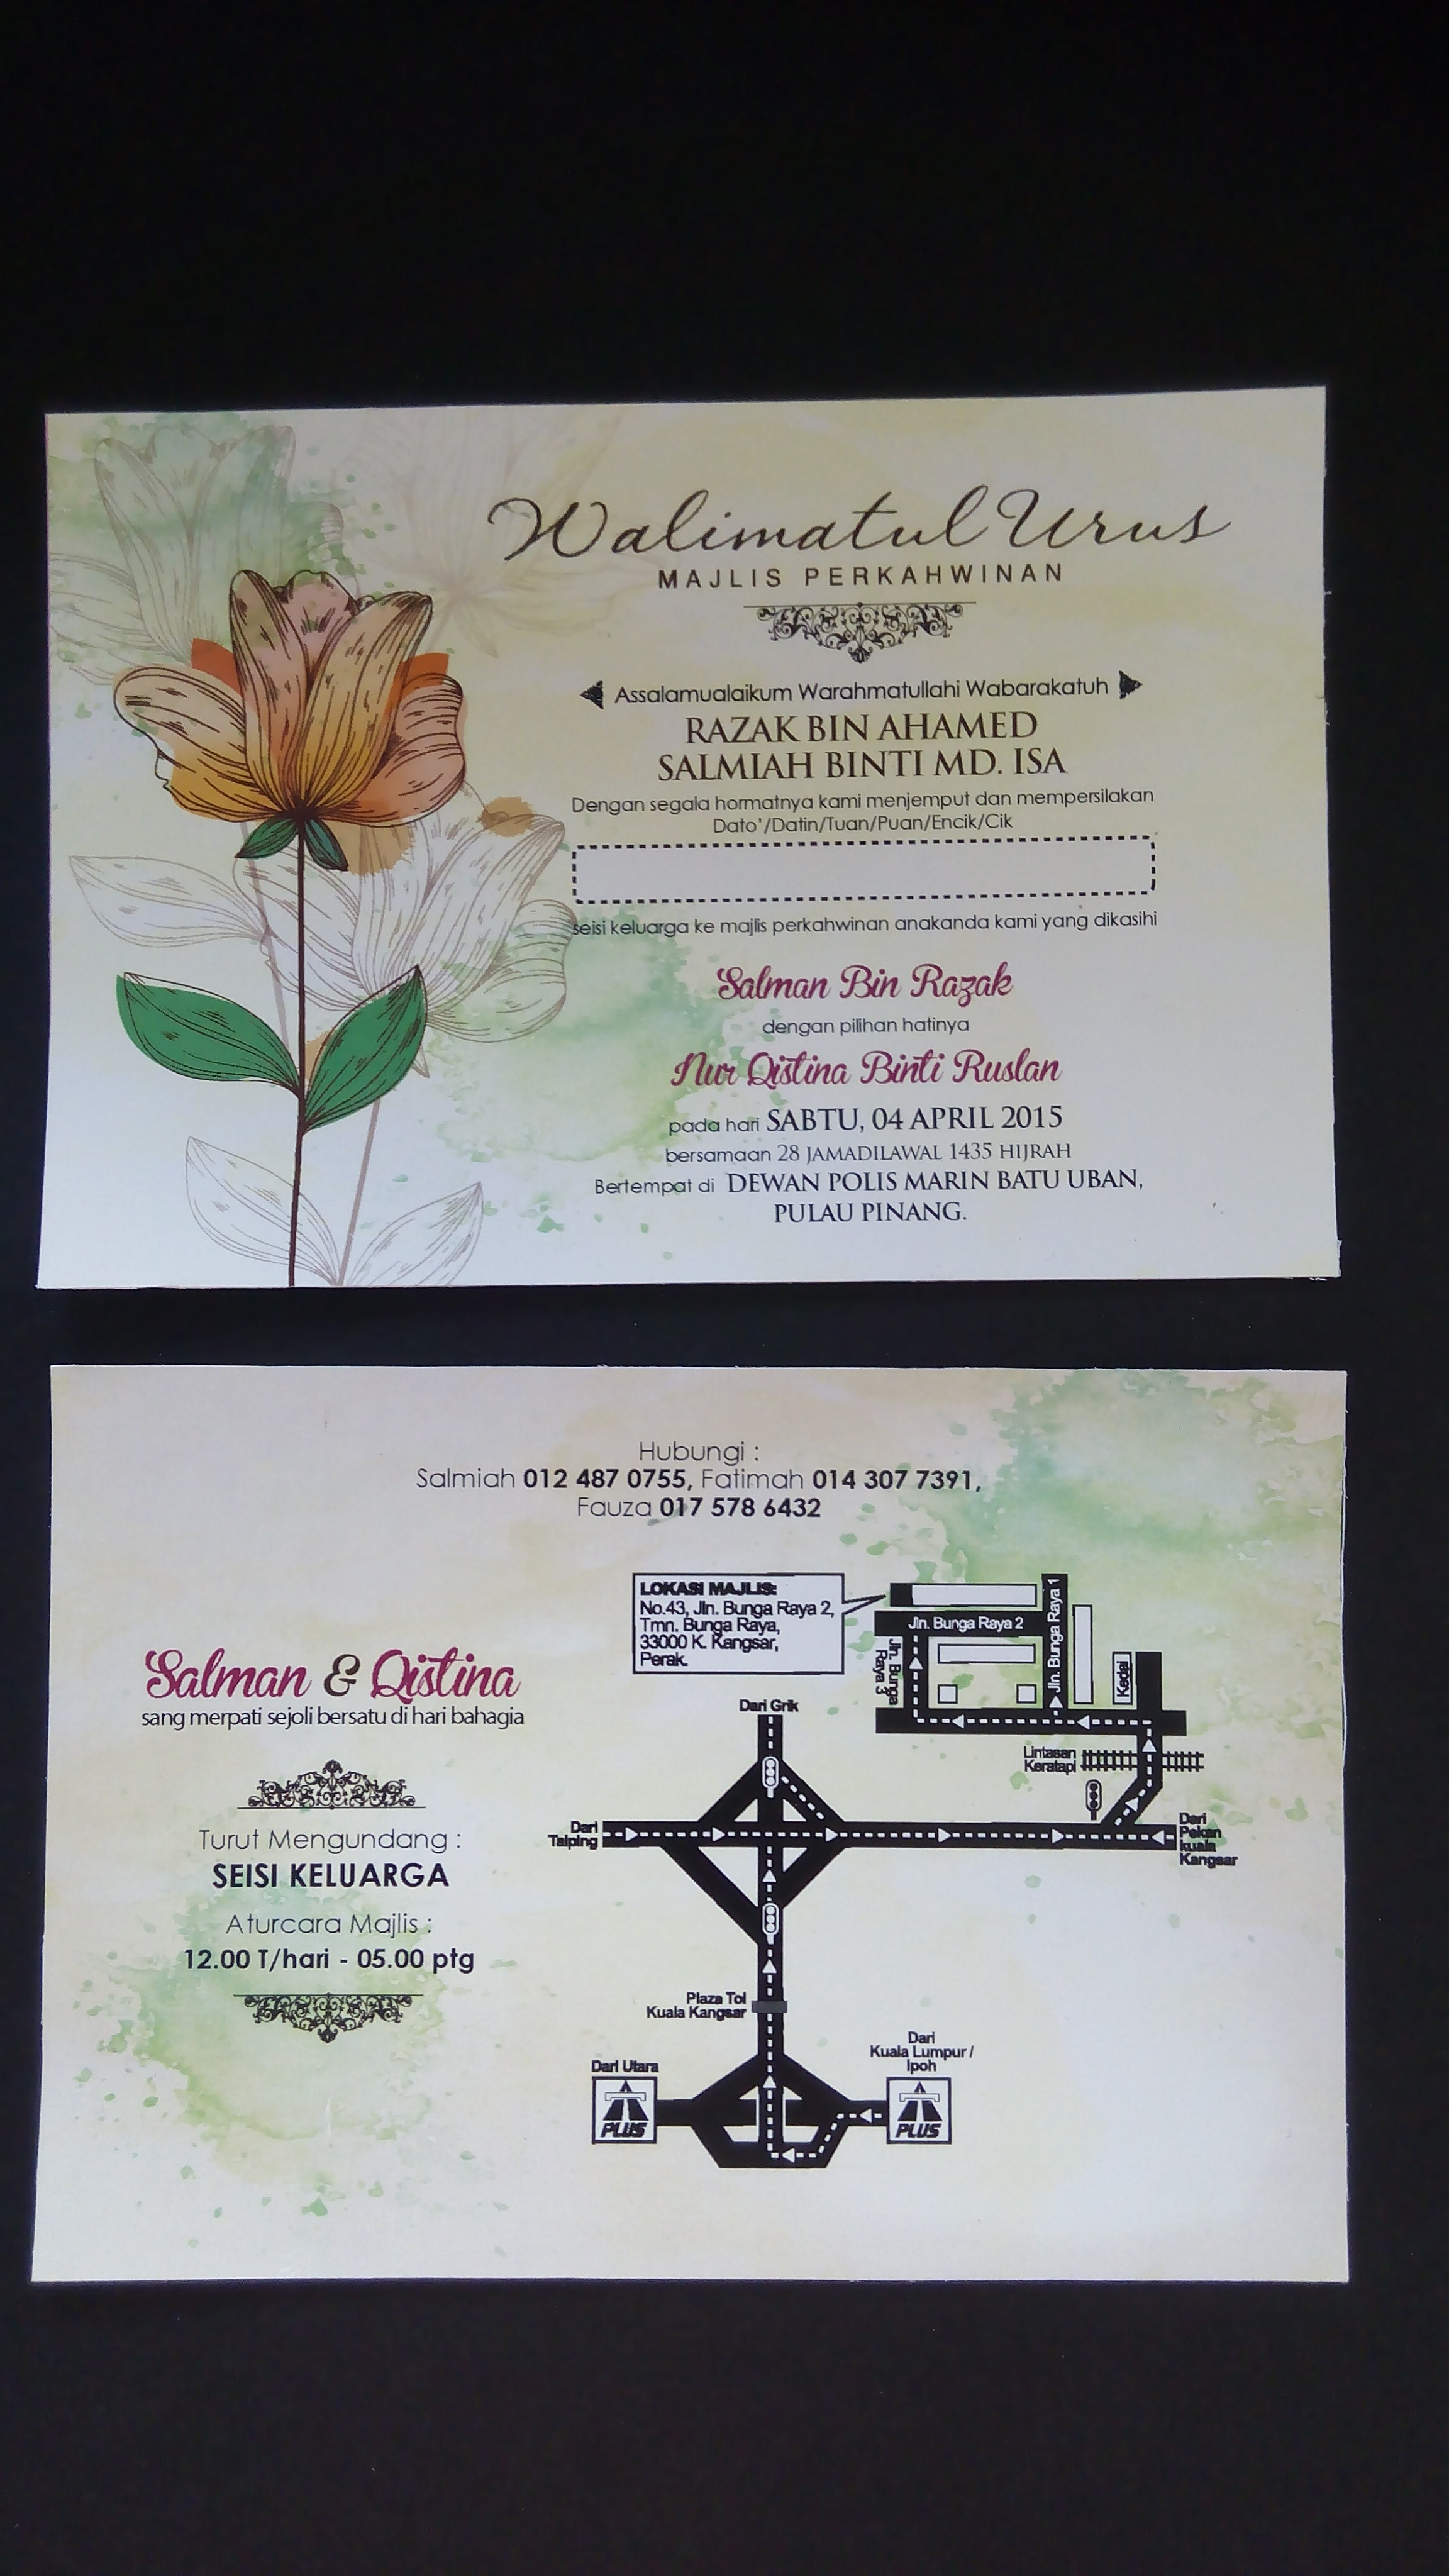 Kadkahwin Penang Kad Kahwin Di Georgetown Pulau Pinang